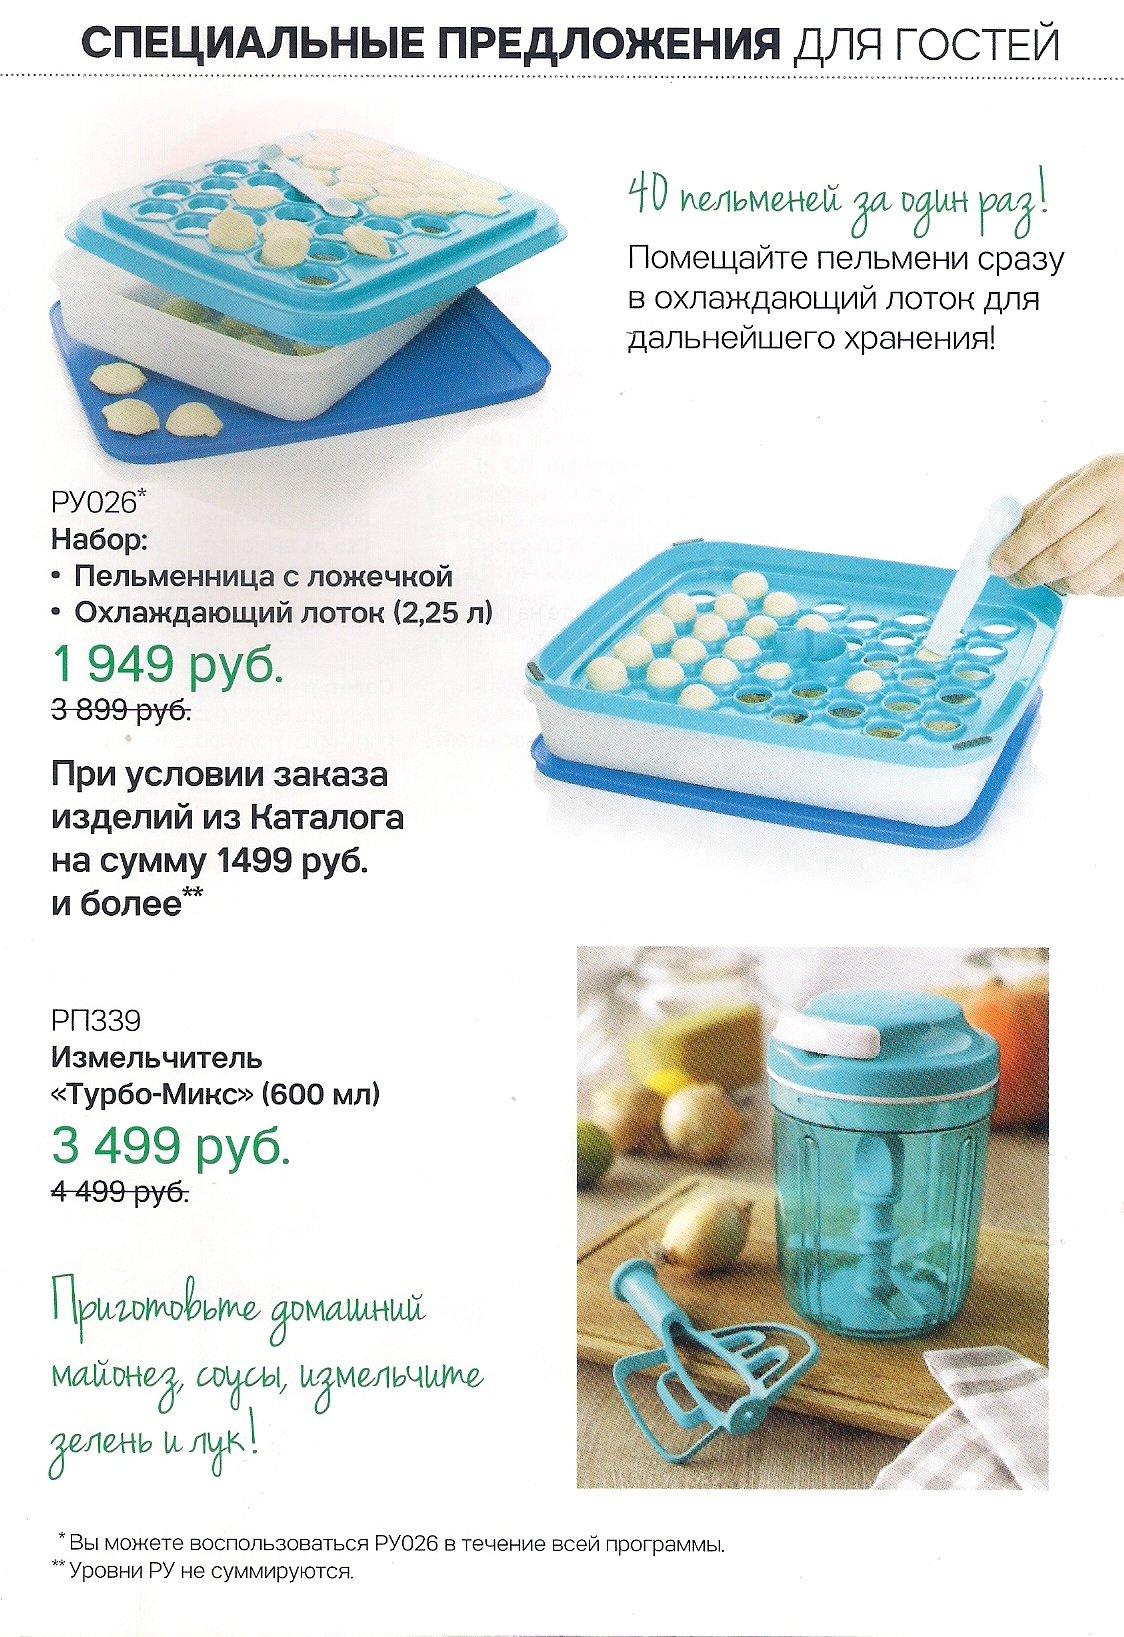 http://tupperware-online.ru/images/upload/3d.jpg